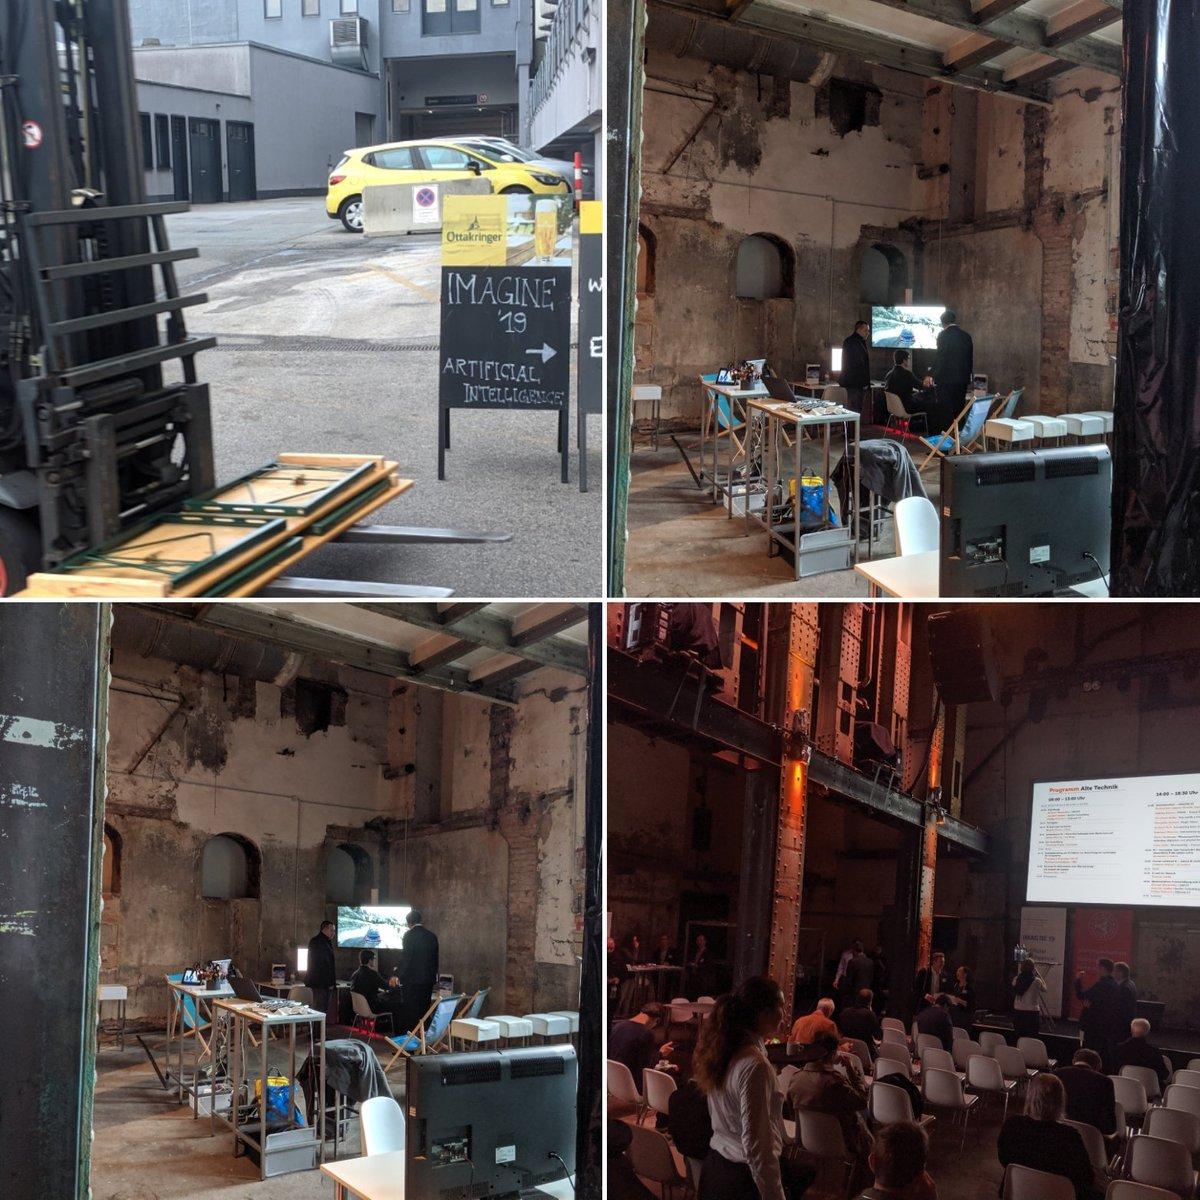 test Twitter Media - AI #imagine19 Konferenz: Turing, Symbole und Demokratie u.a. #ottakringerBrauerei https://t.co/VwBXkX6CUW